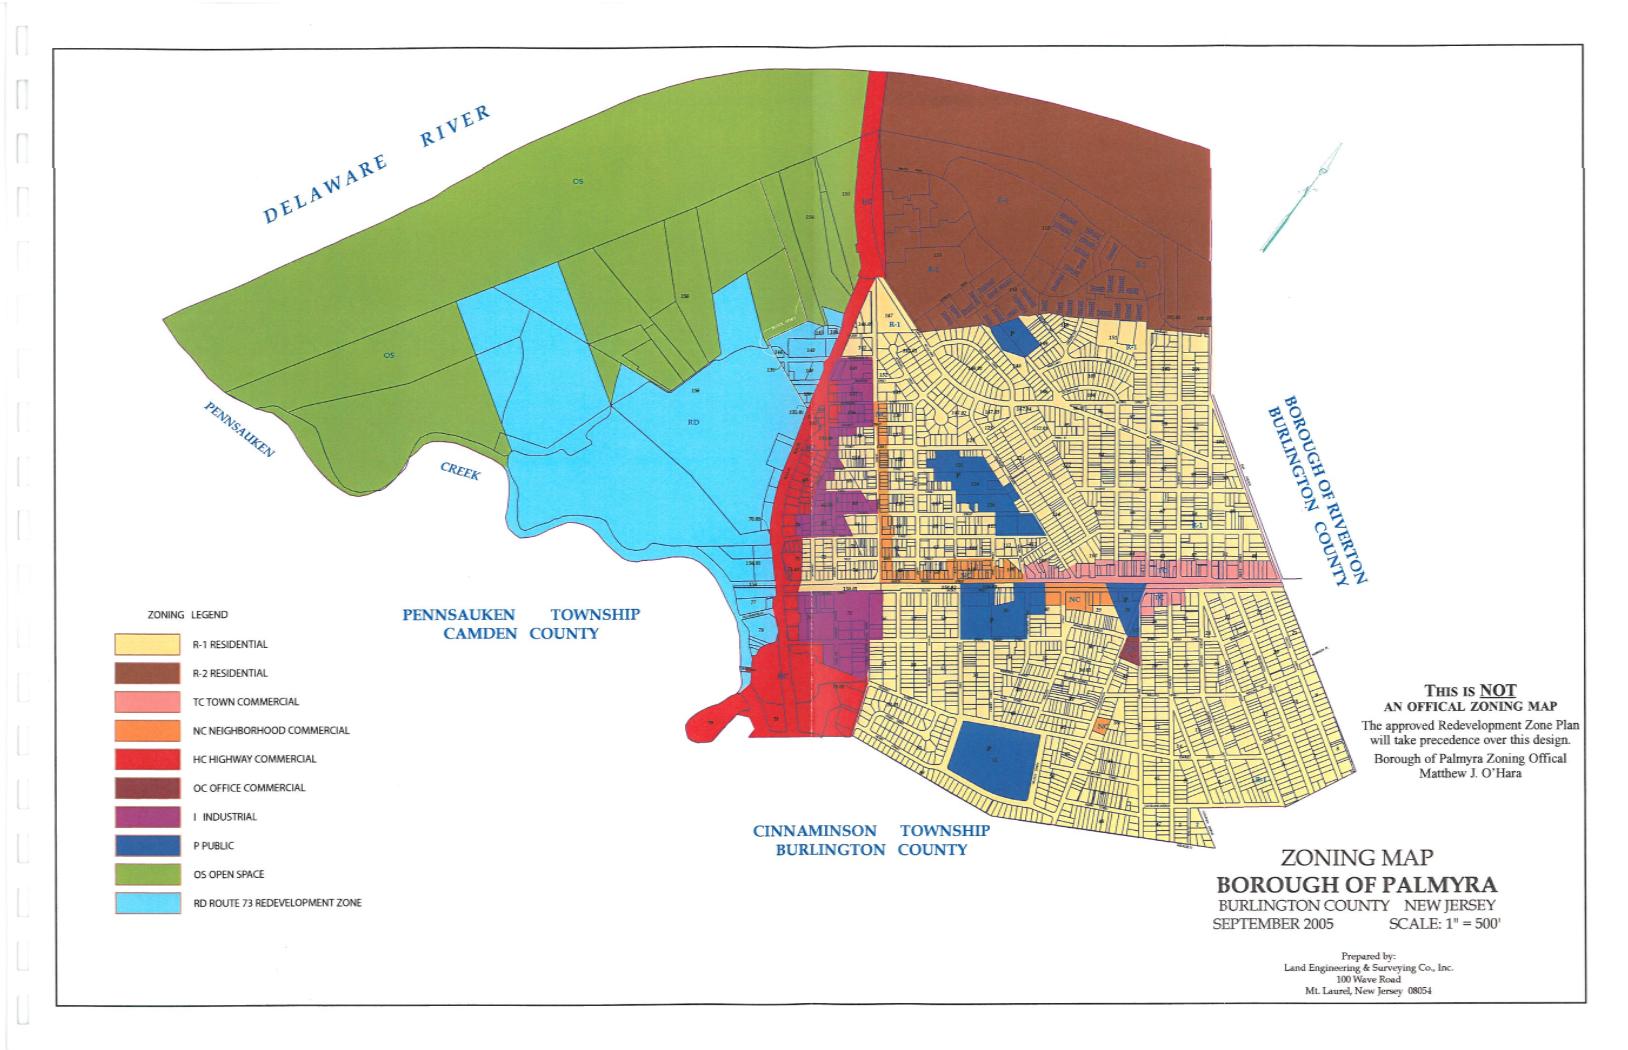 Zoning Land Use Board Borough Of Palmyra - Land height